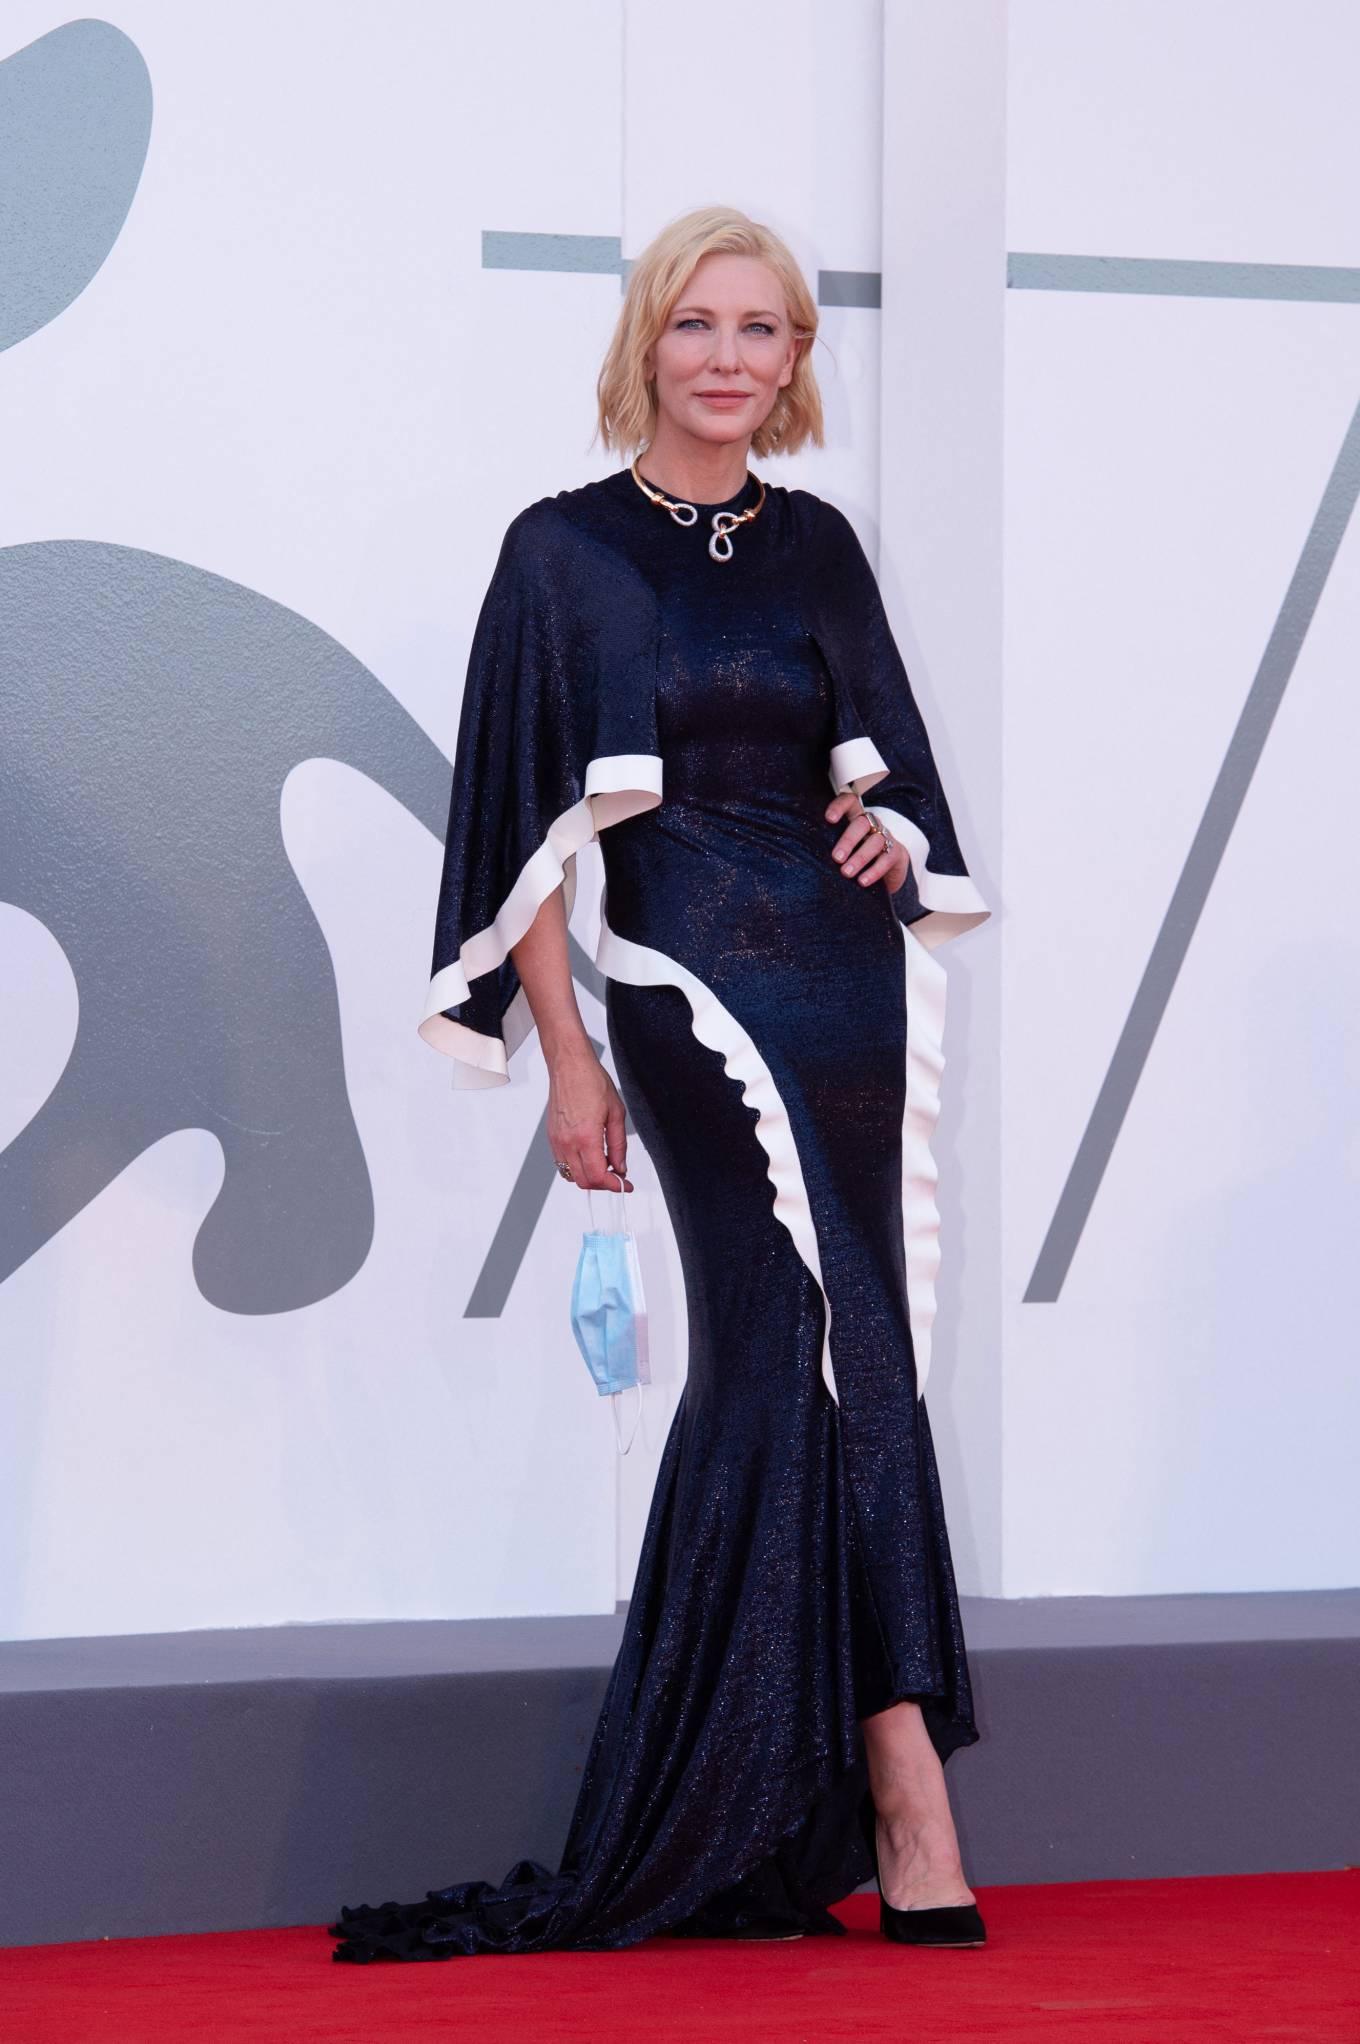 Cate Blanchett 2020 : Cate Blanchett attending Opening Ceremony at 2020 Venice International Film Festival – Italy-10